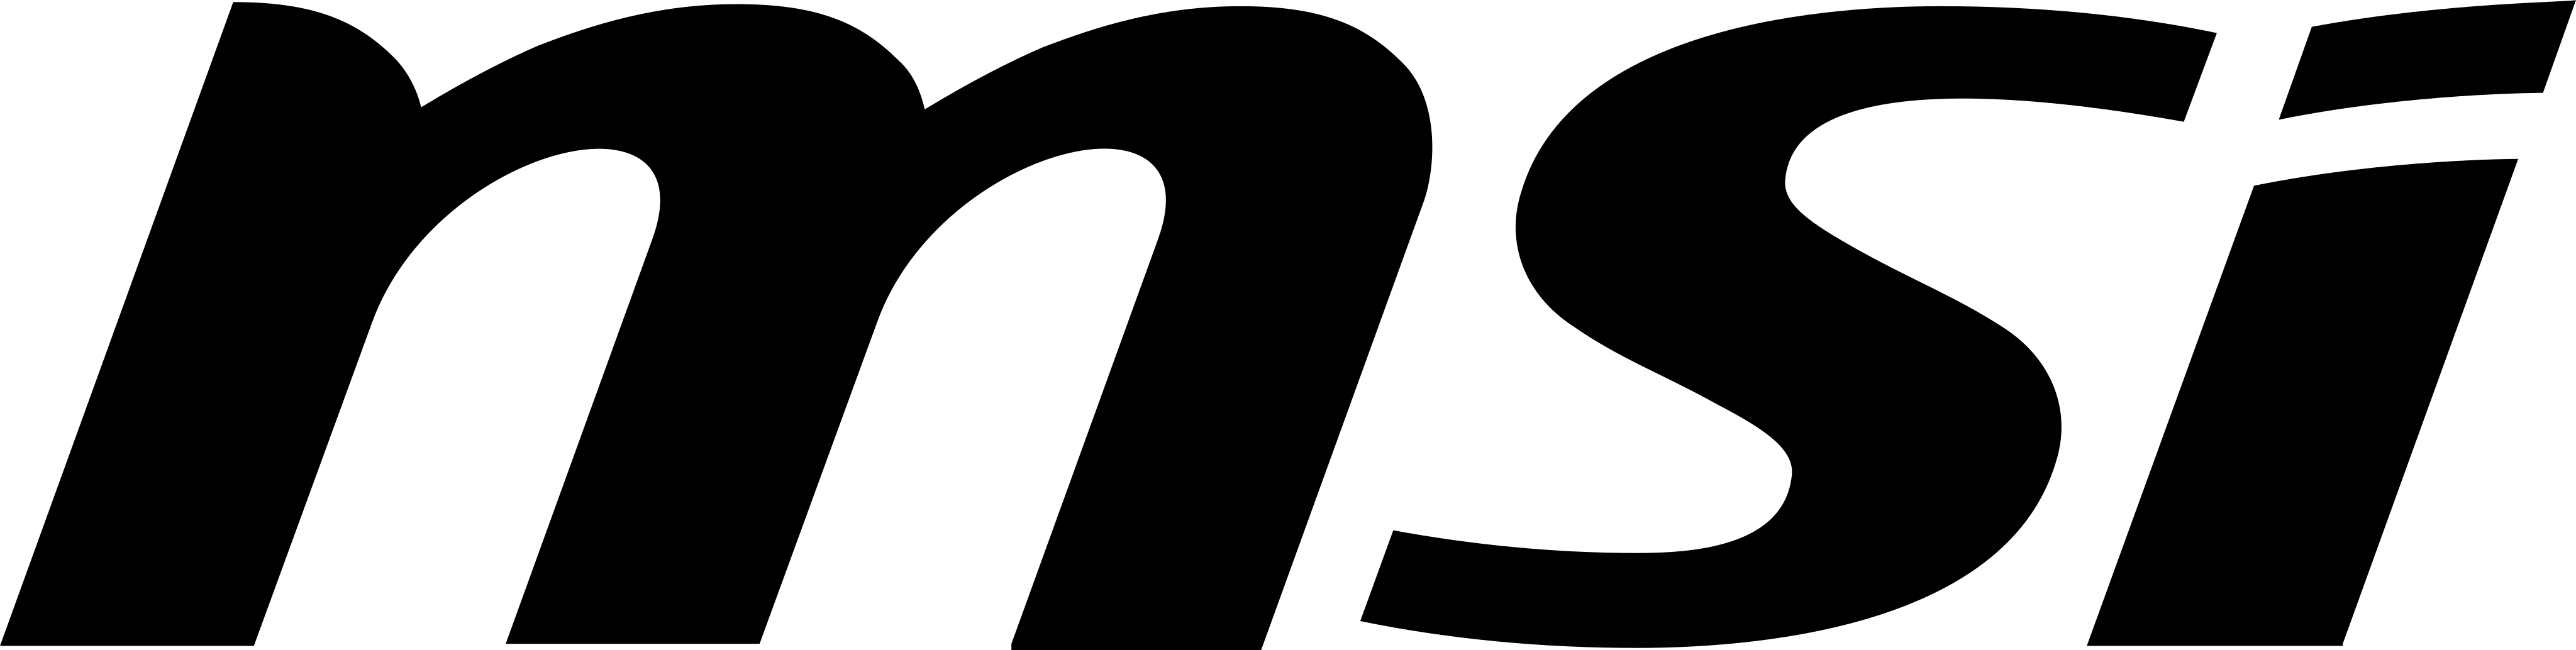 msi logo 7 - MSI Logo